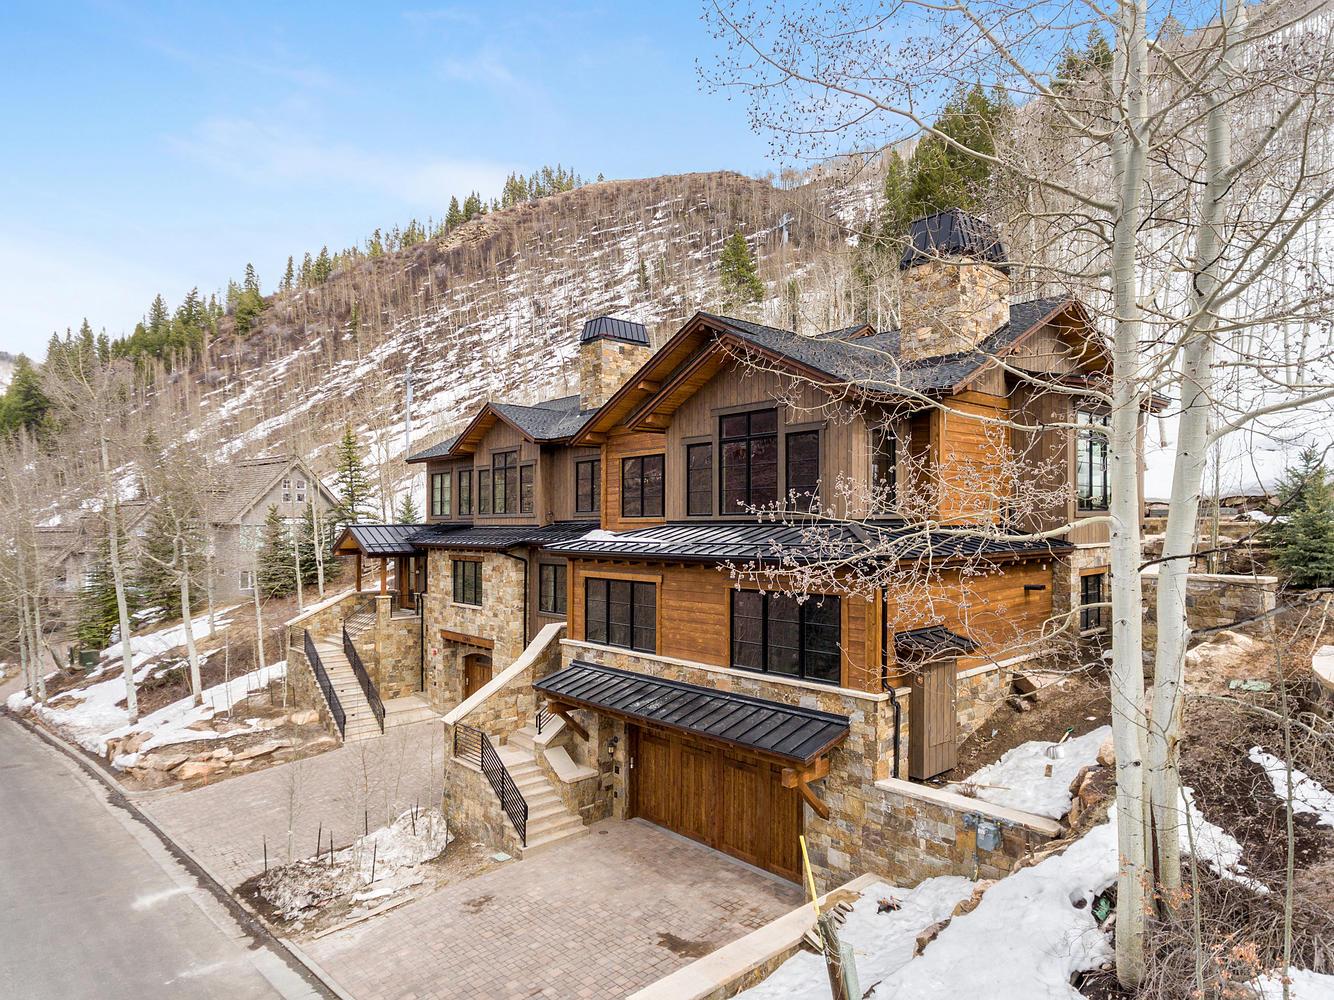 Dôi vì Bán tại New Mountain Modern Duplex in Cascade Village 1242 Westhaven Circle Cascade Village, Vail, Colorado, 81657 Hoa Kỳ